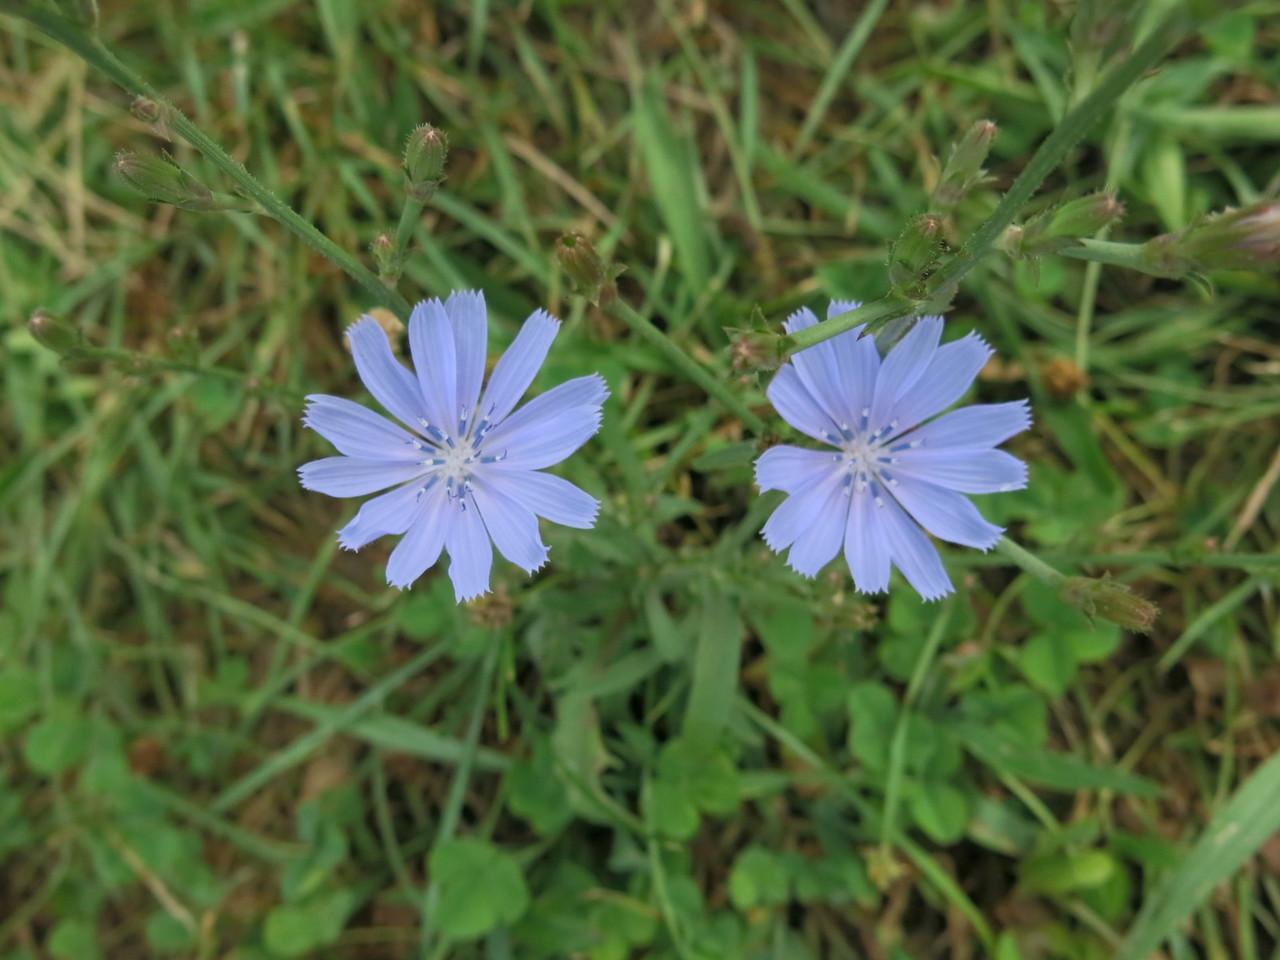 Delightful wild flowers